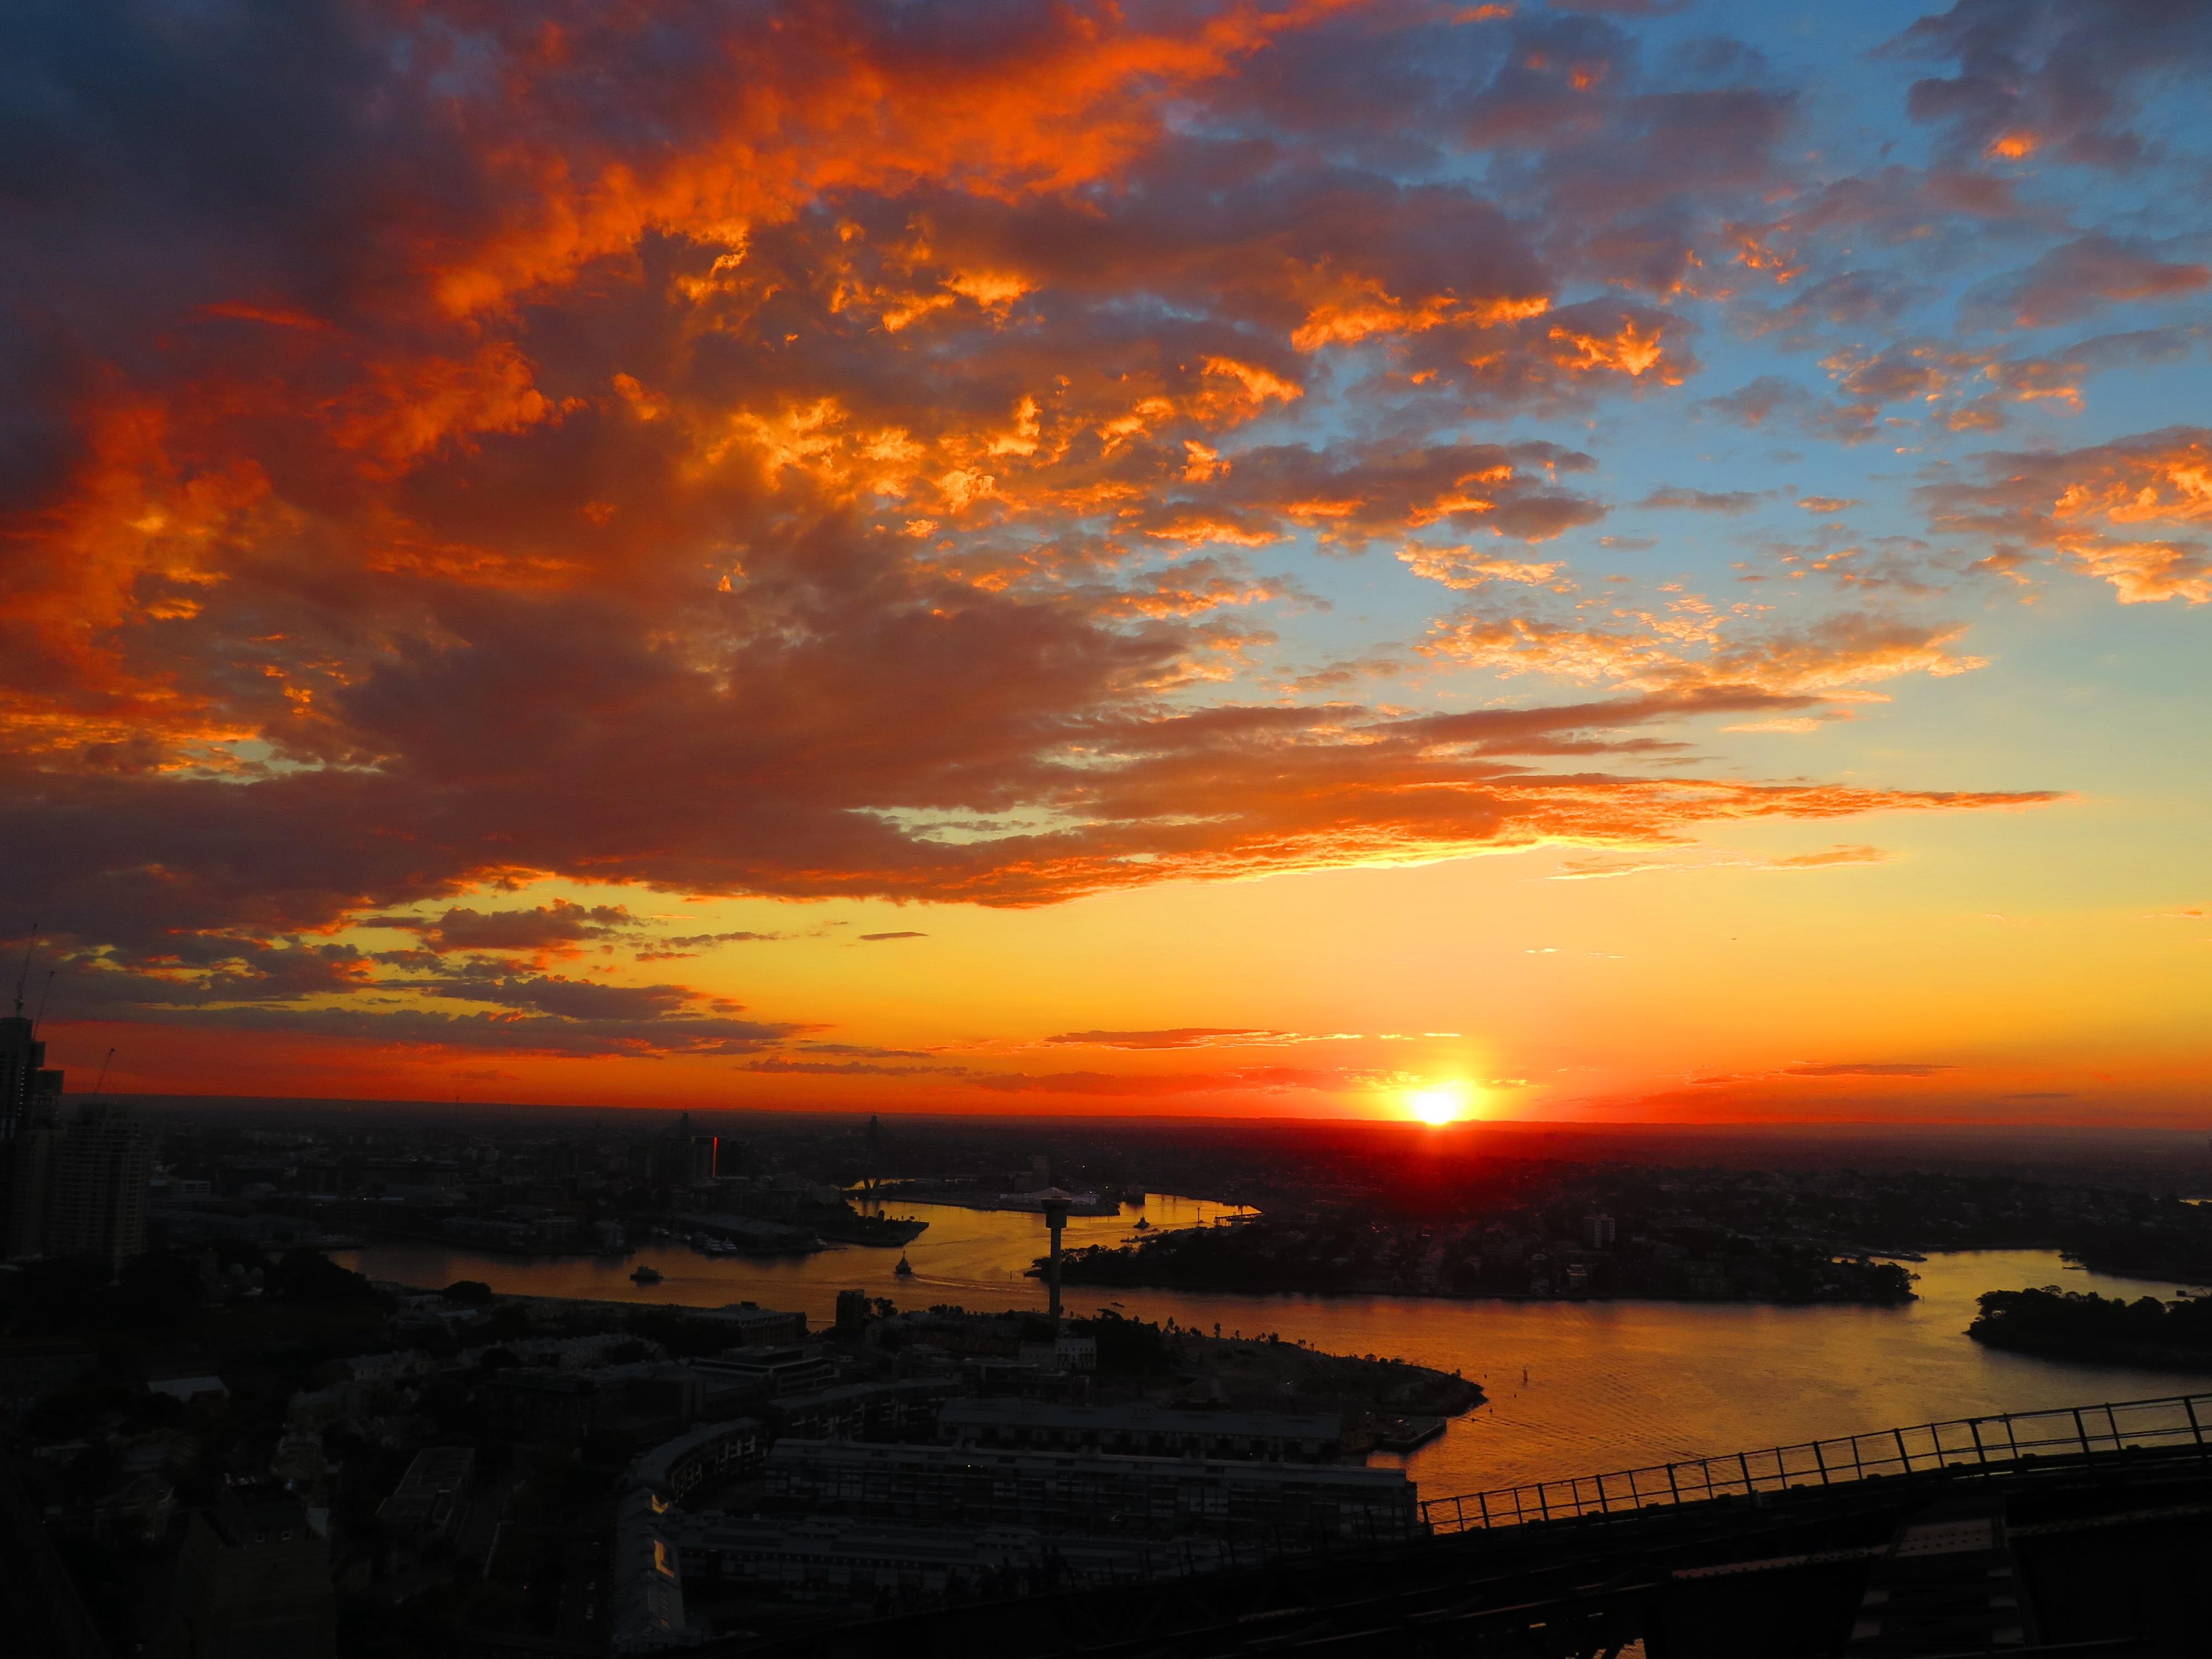 Sunset in Sydney from Harbour BridgeBridge Climb Sydney